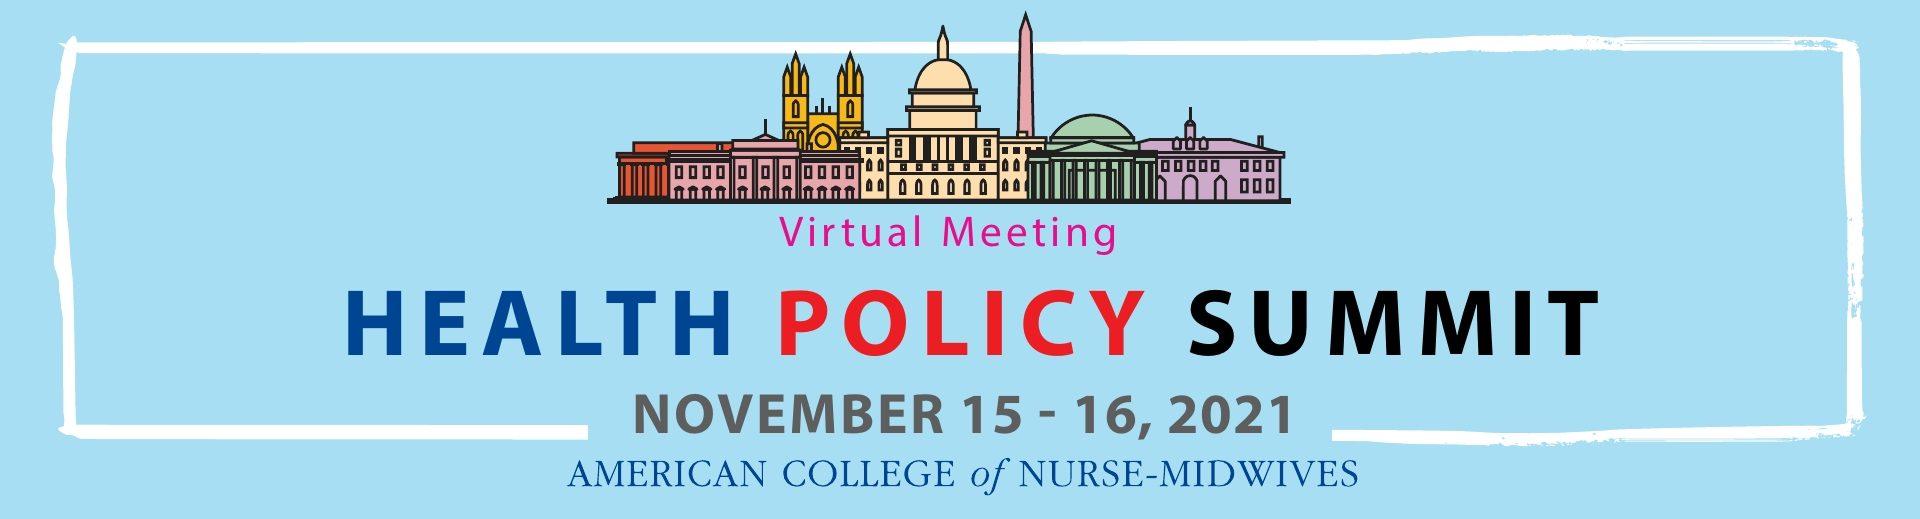 ACNM Health Policy Summit